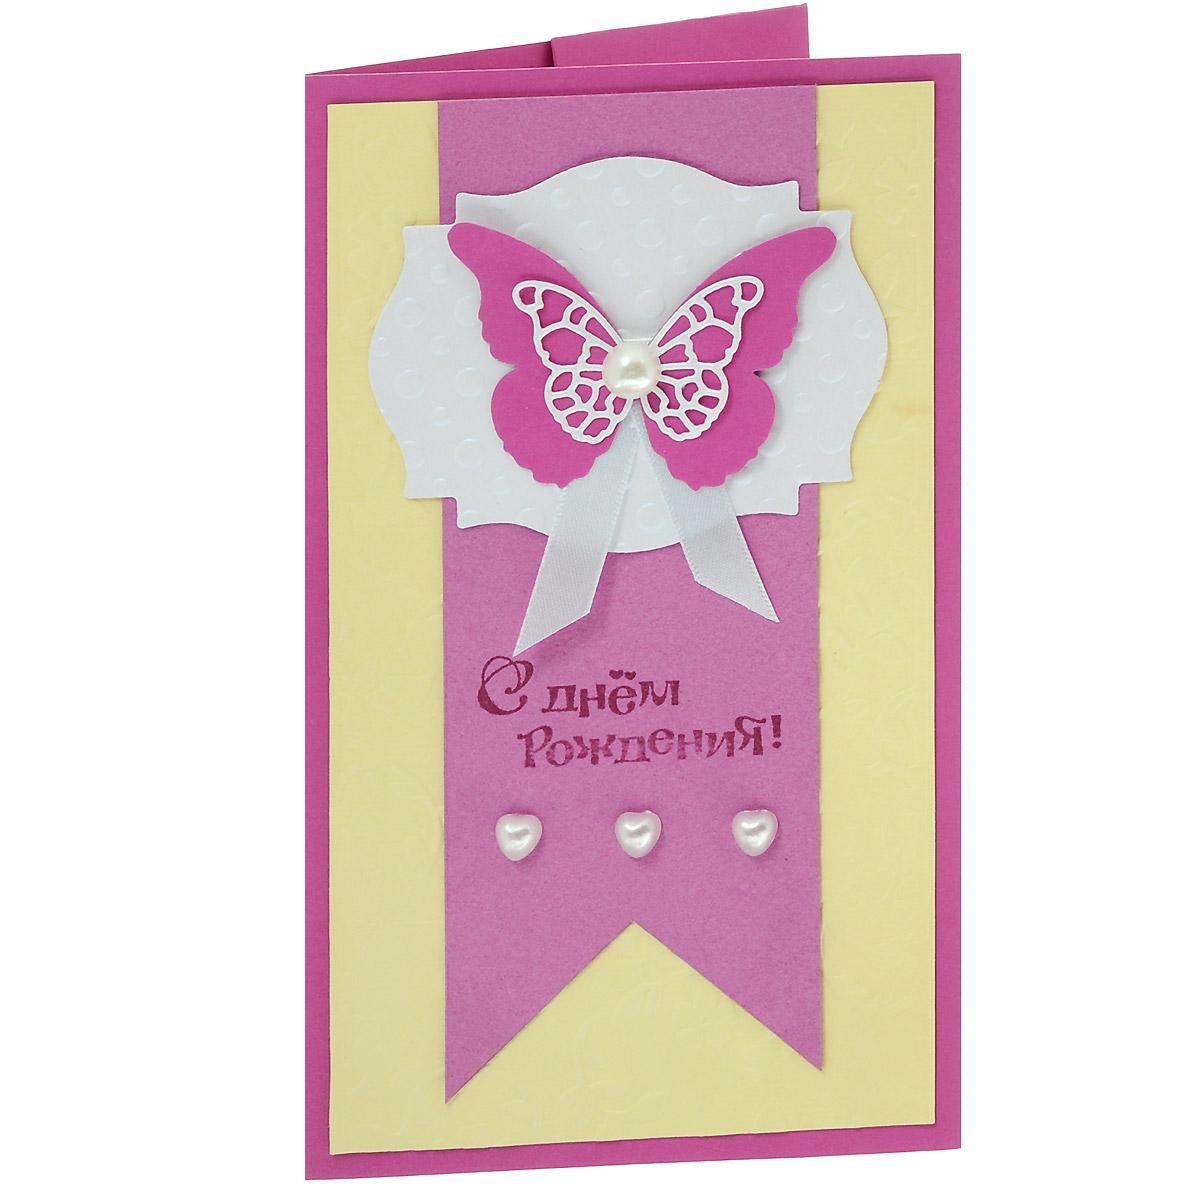 "Студия ""Тётя Роза"" ОЖ-0015 Открытка-конверт «С Днём Рождения!» (бабочка на фрейме). Студия «Тётя Роза»"